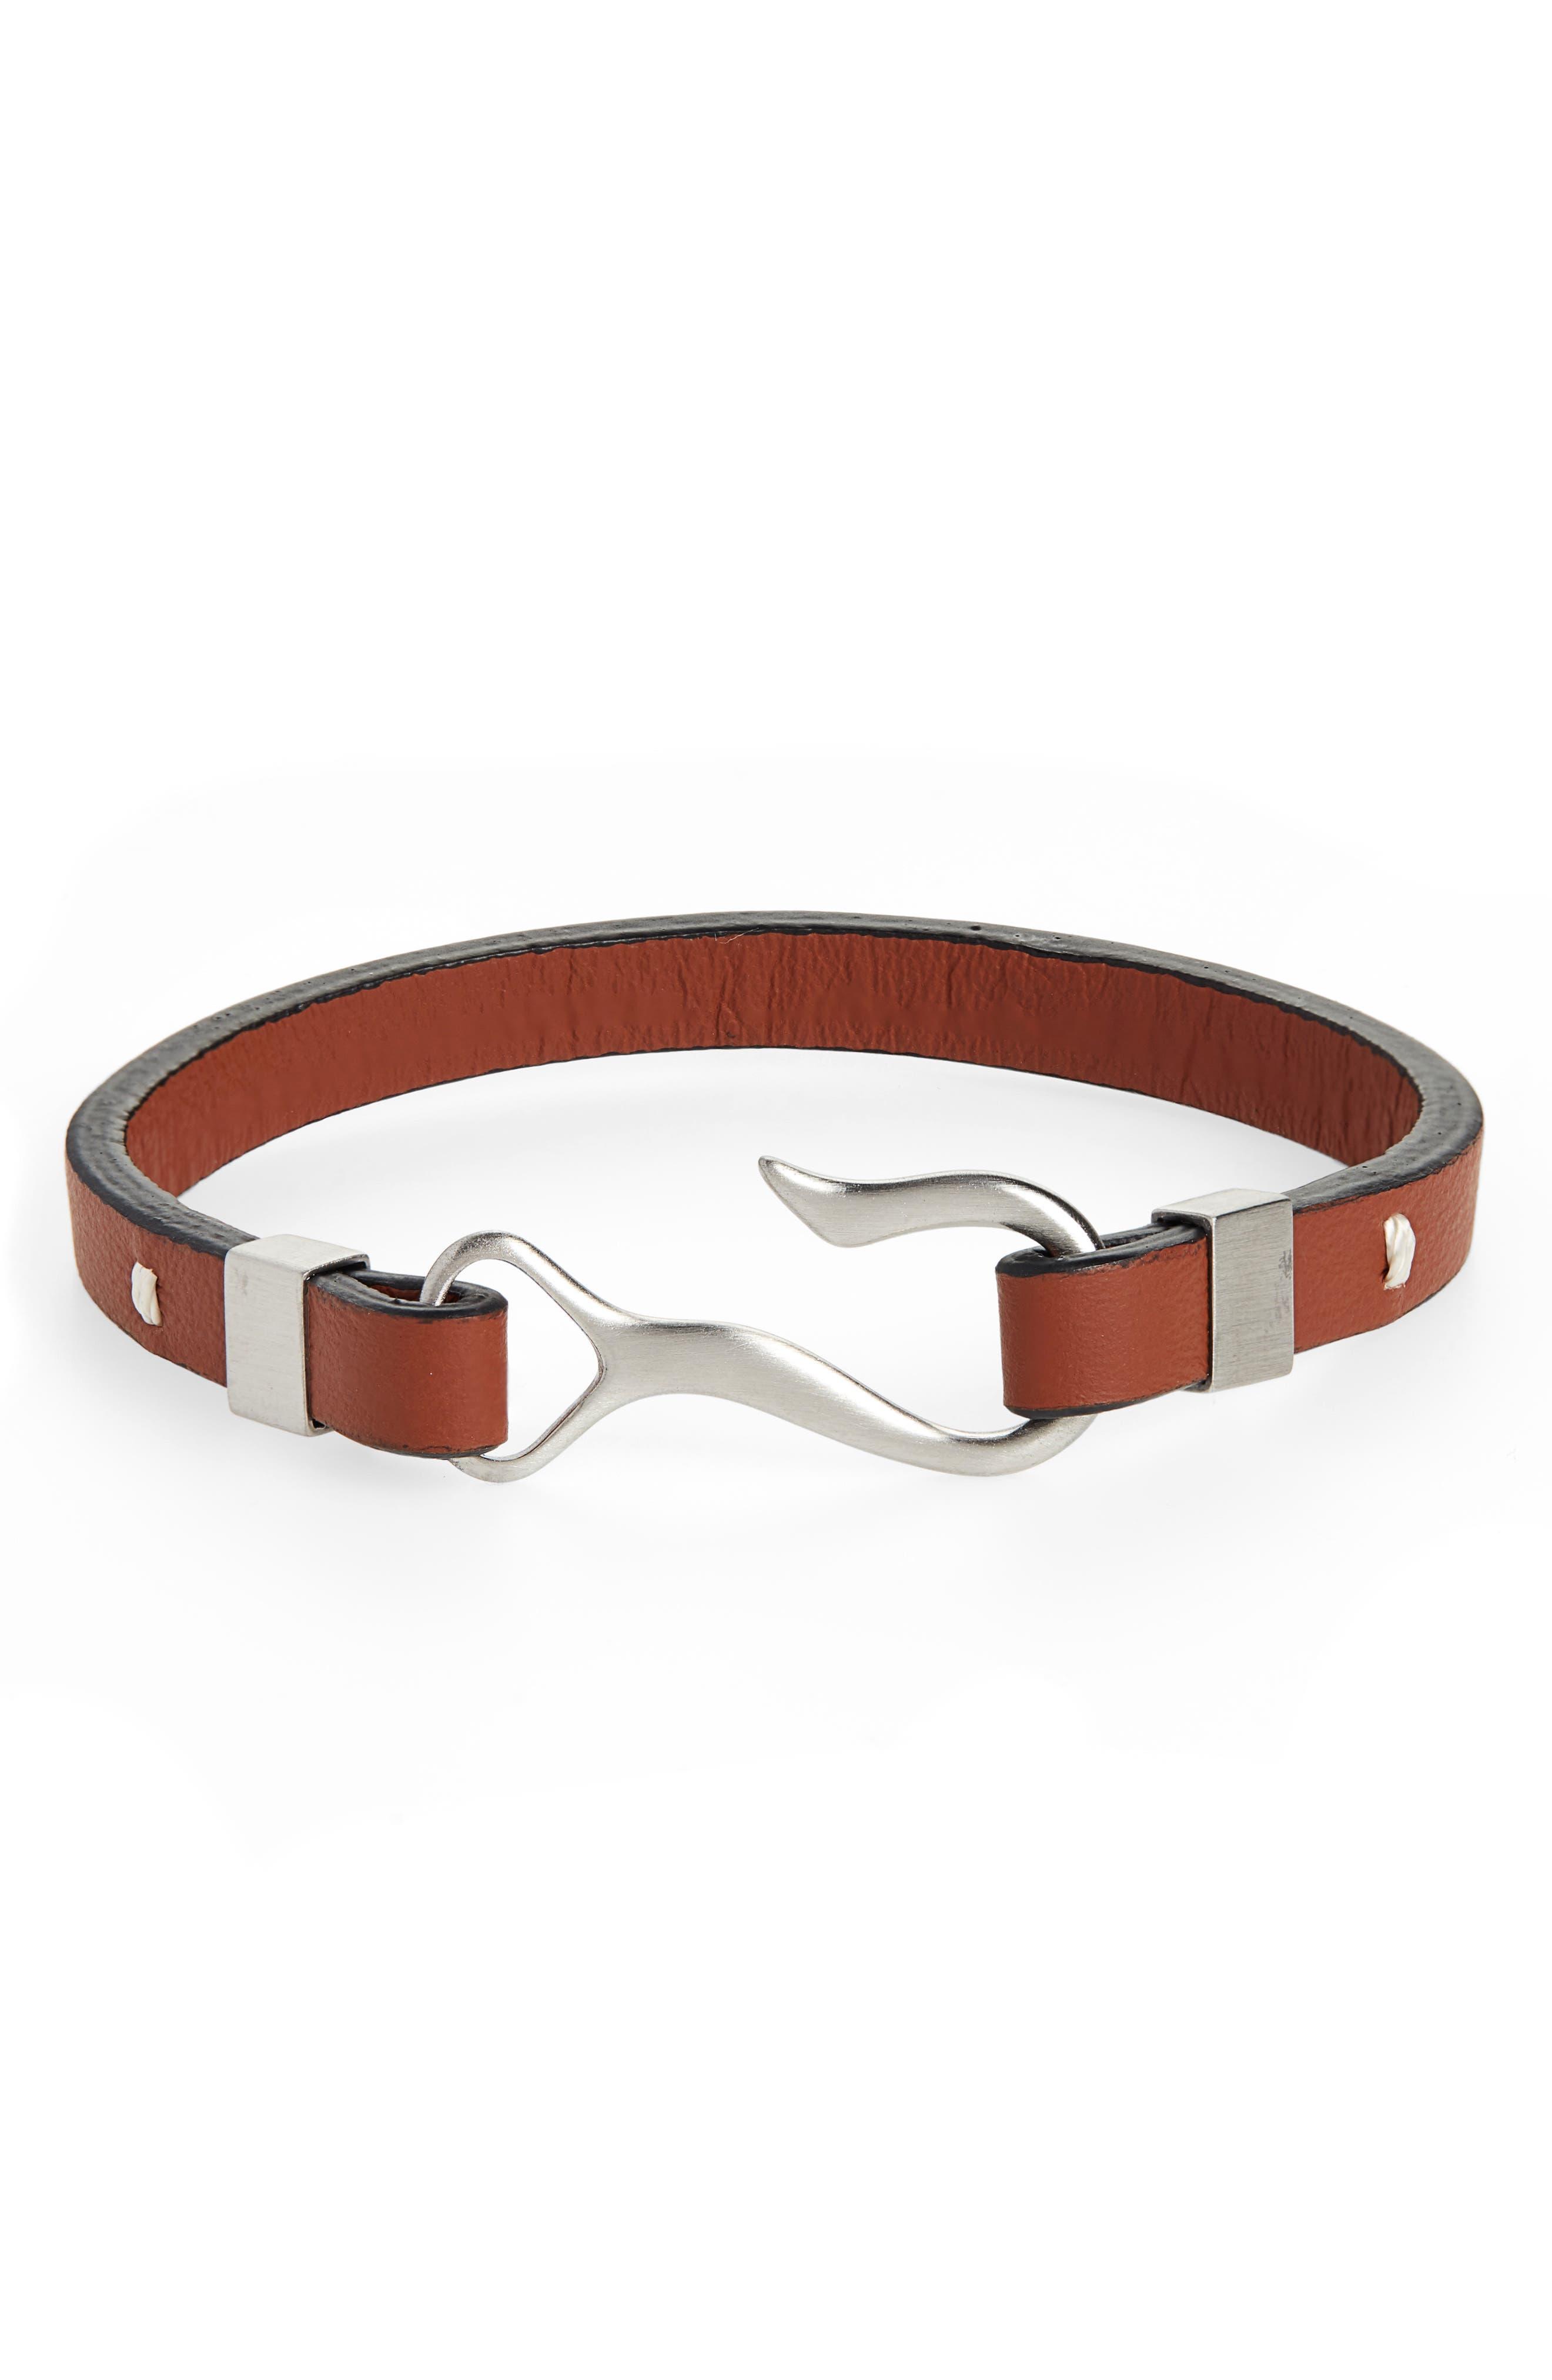 NORDSTROM MEN'S SHOP, Leather Hook Bracelet, Main thumbnail 1, color, BROWN